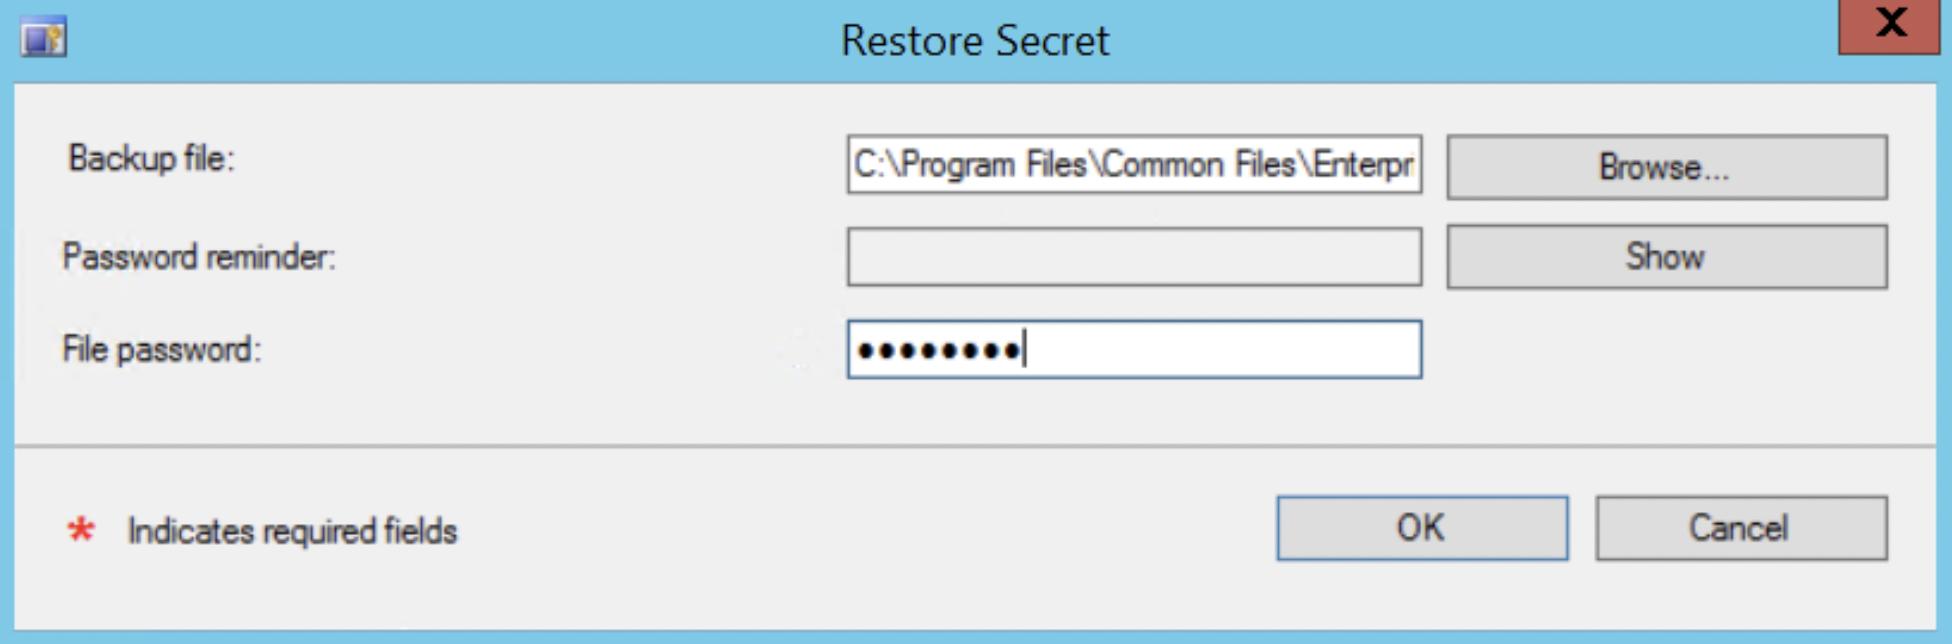 Restore Secret